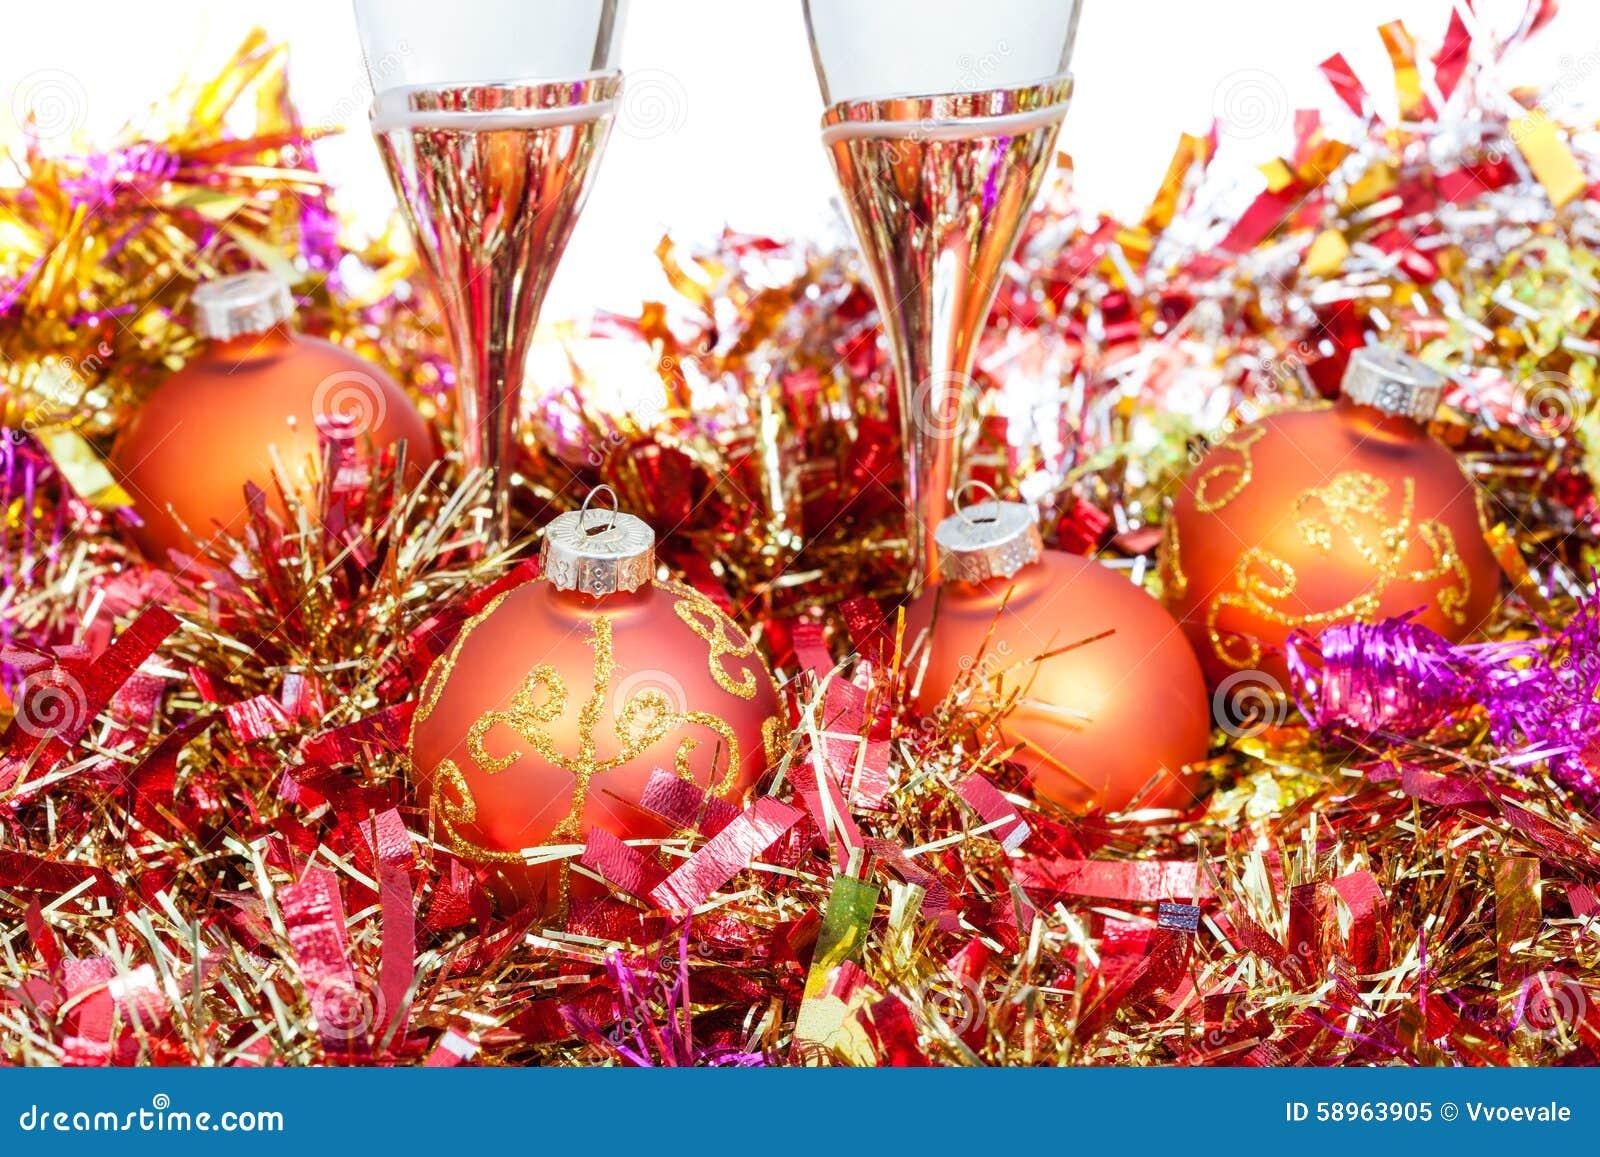 Glasses At Orange Xmas Decorations Close Up Stock Photo